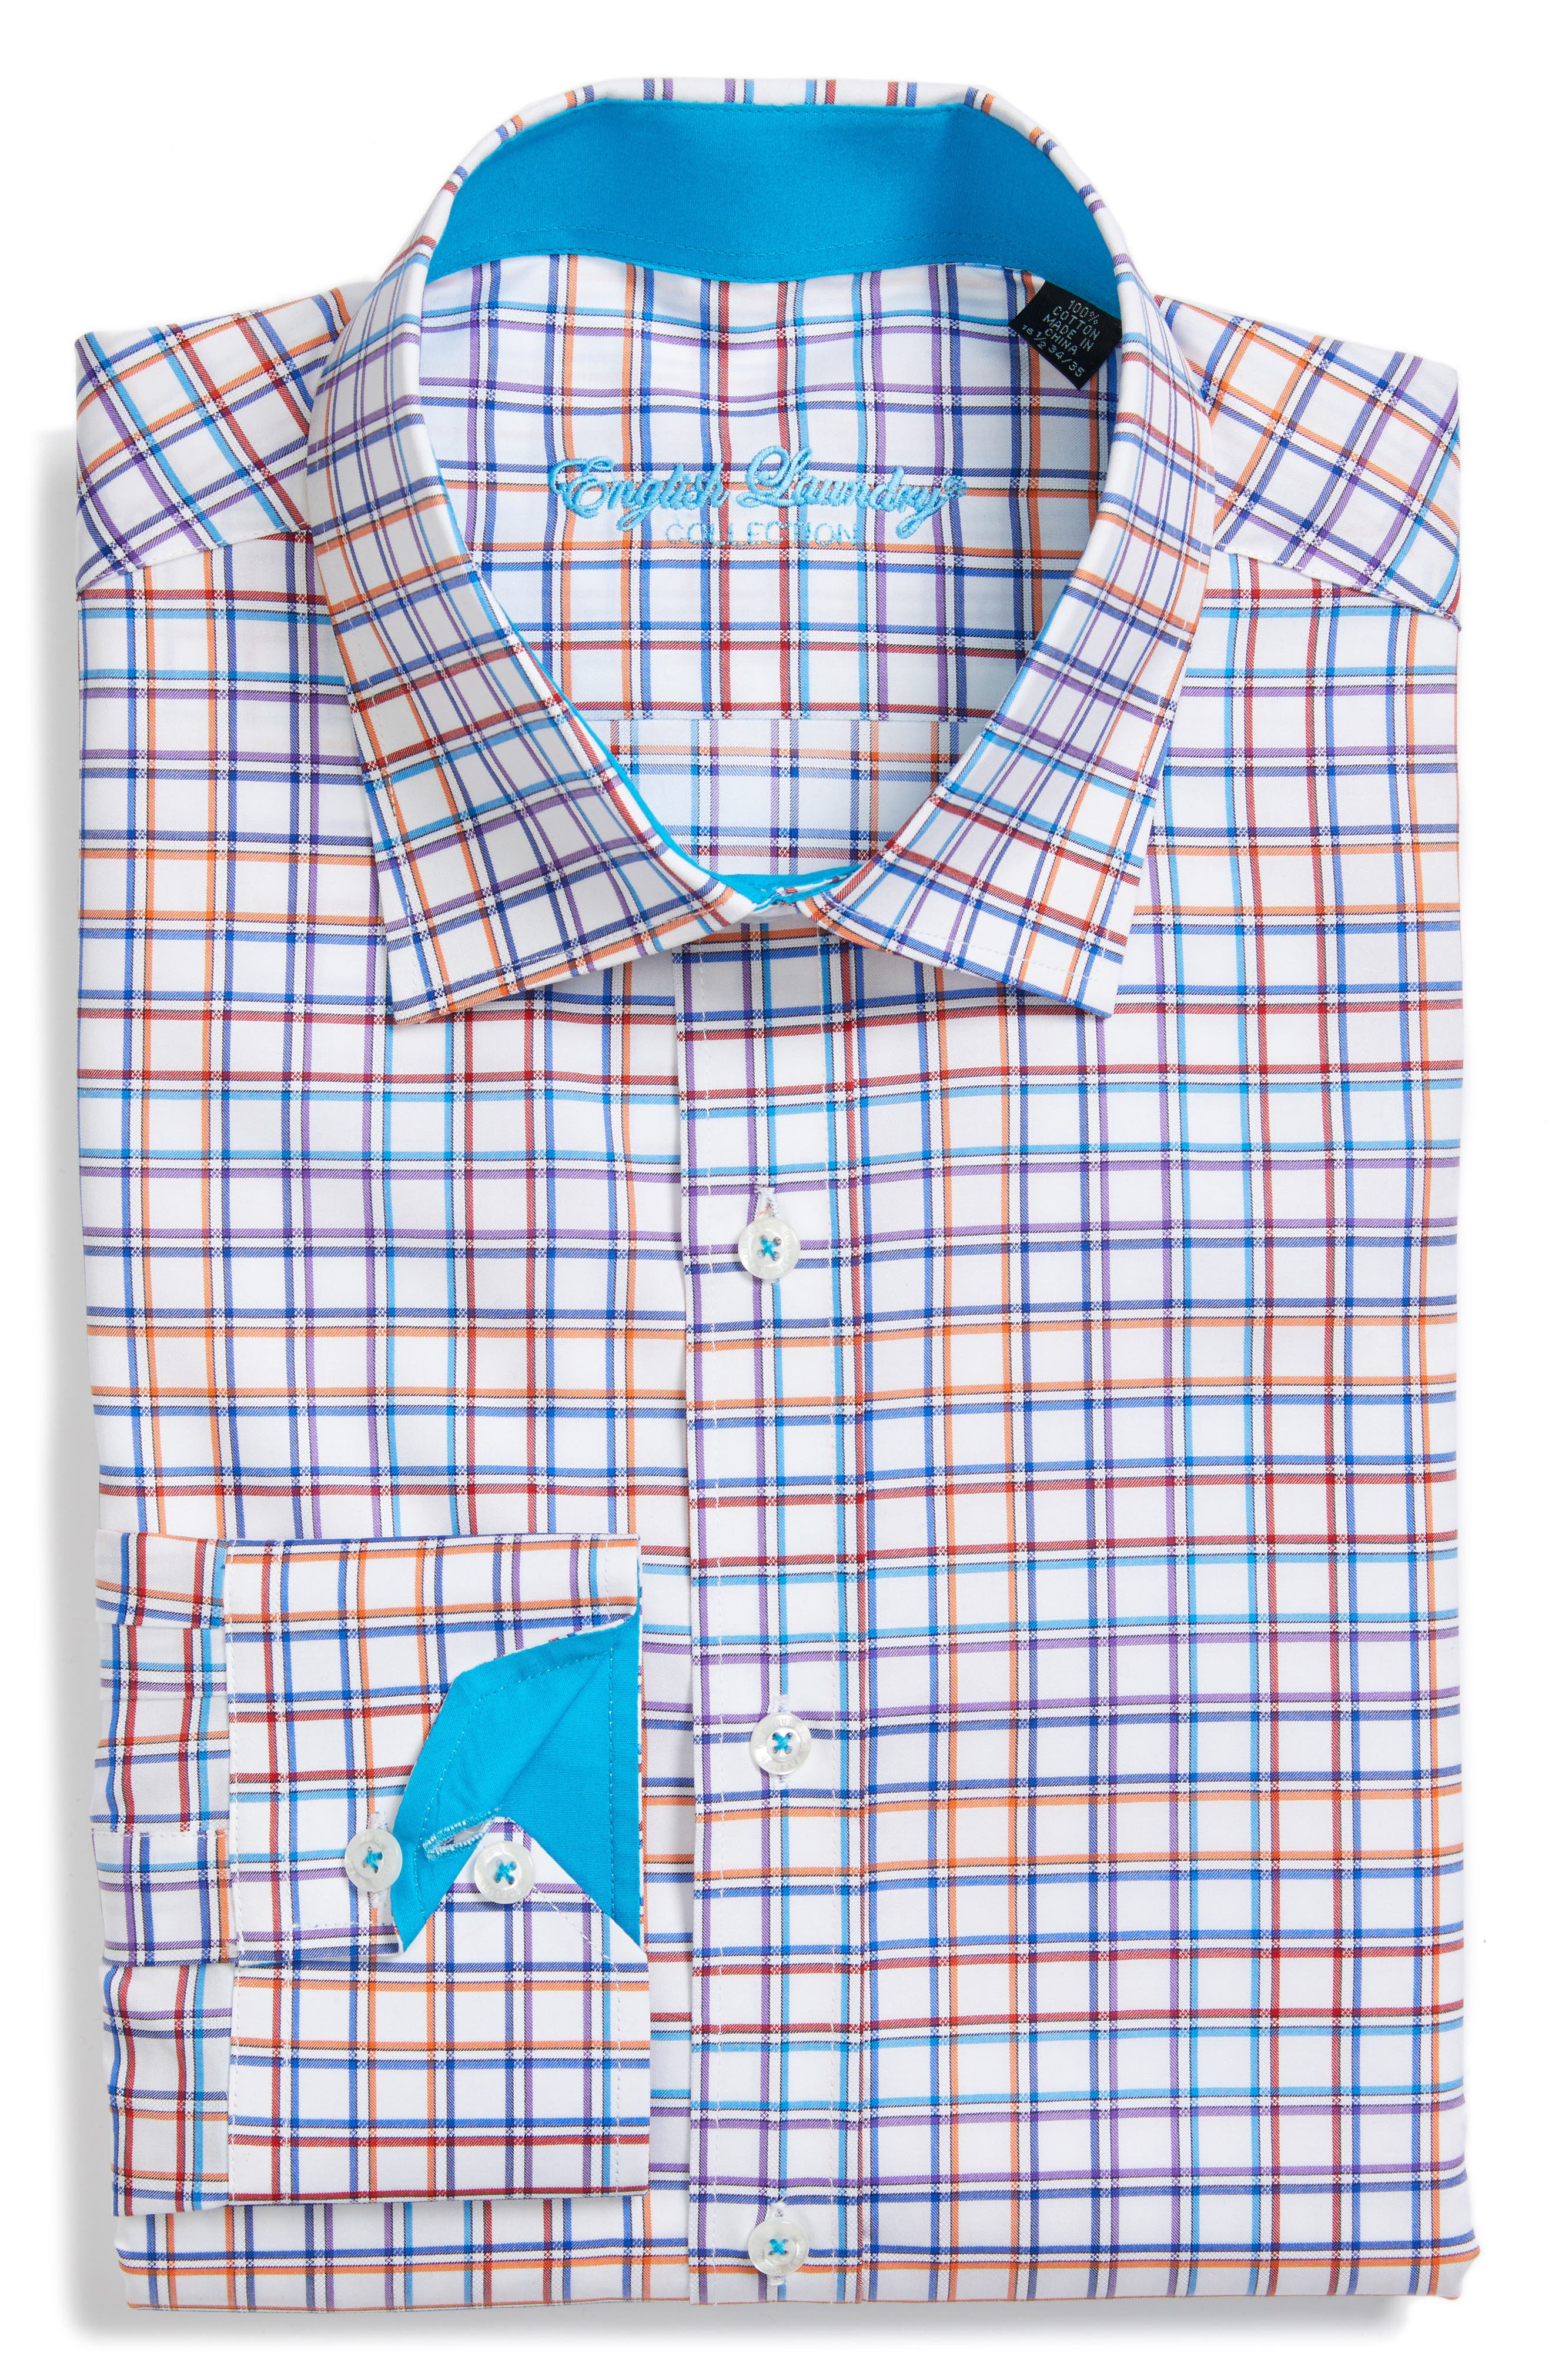 Trim Fit Check Dress Shirt,                         Main,                         color, 100